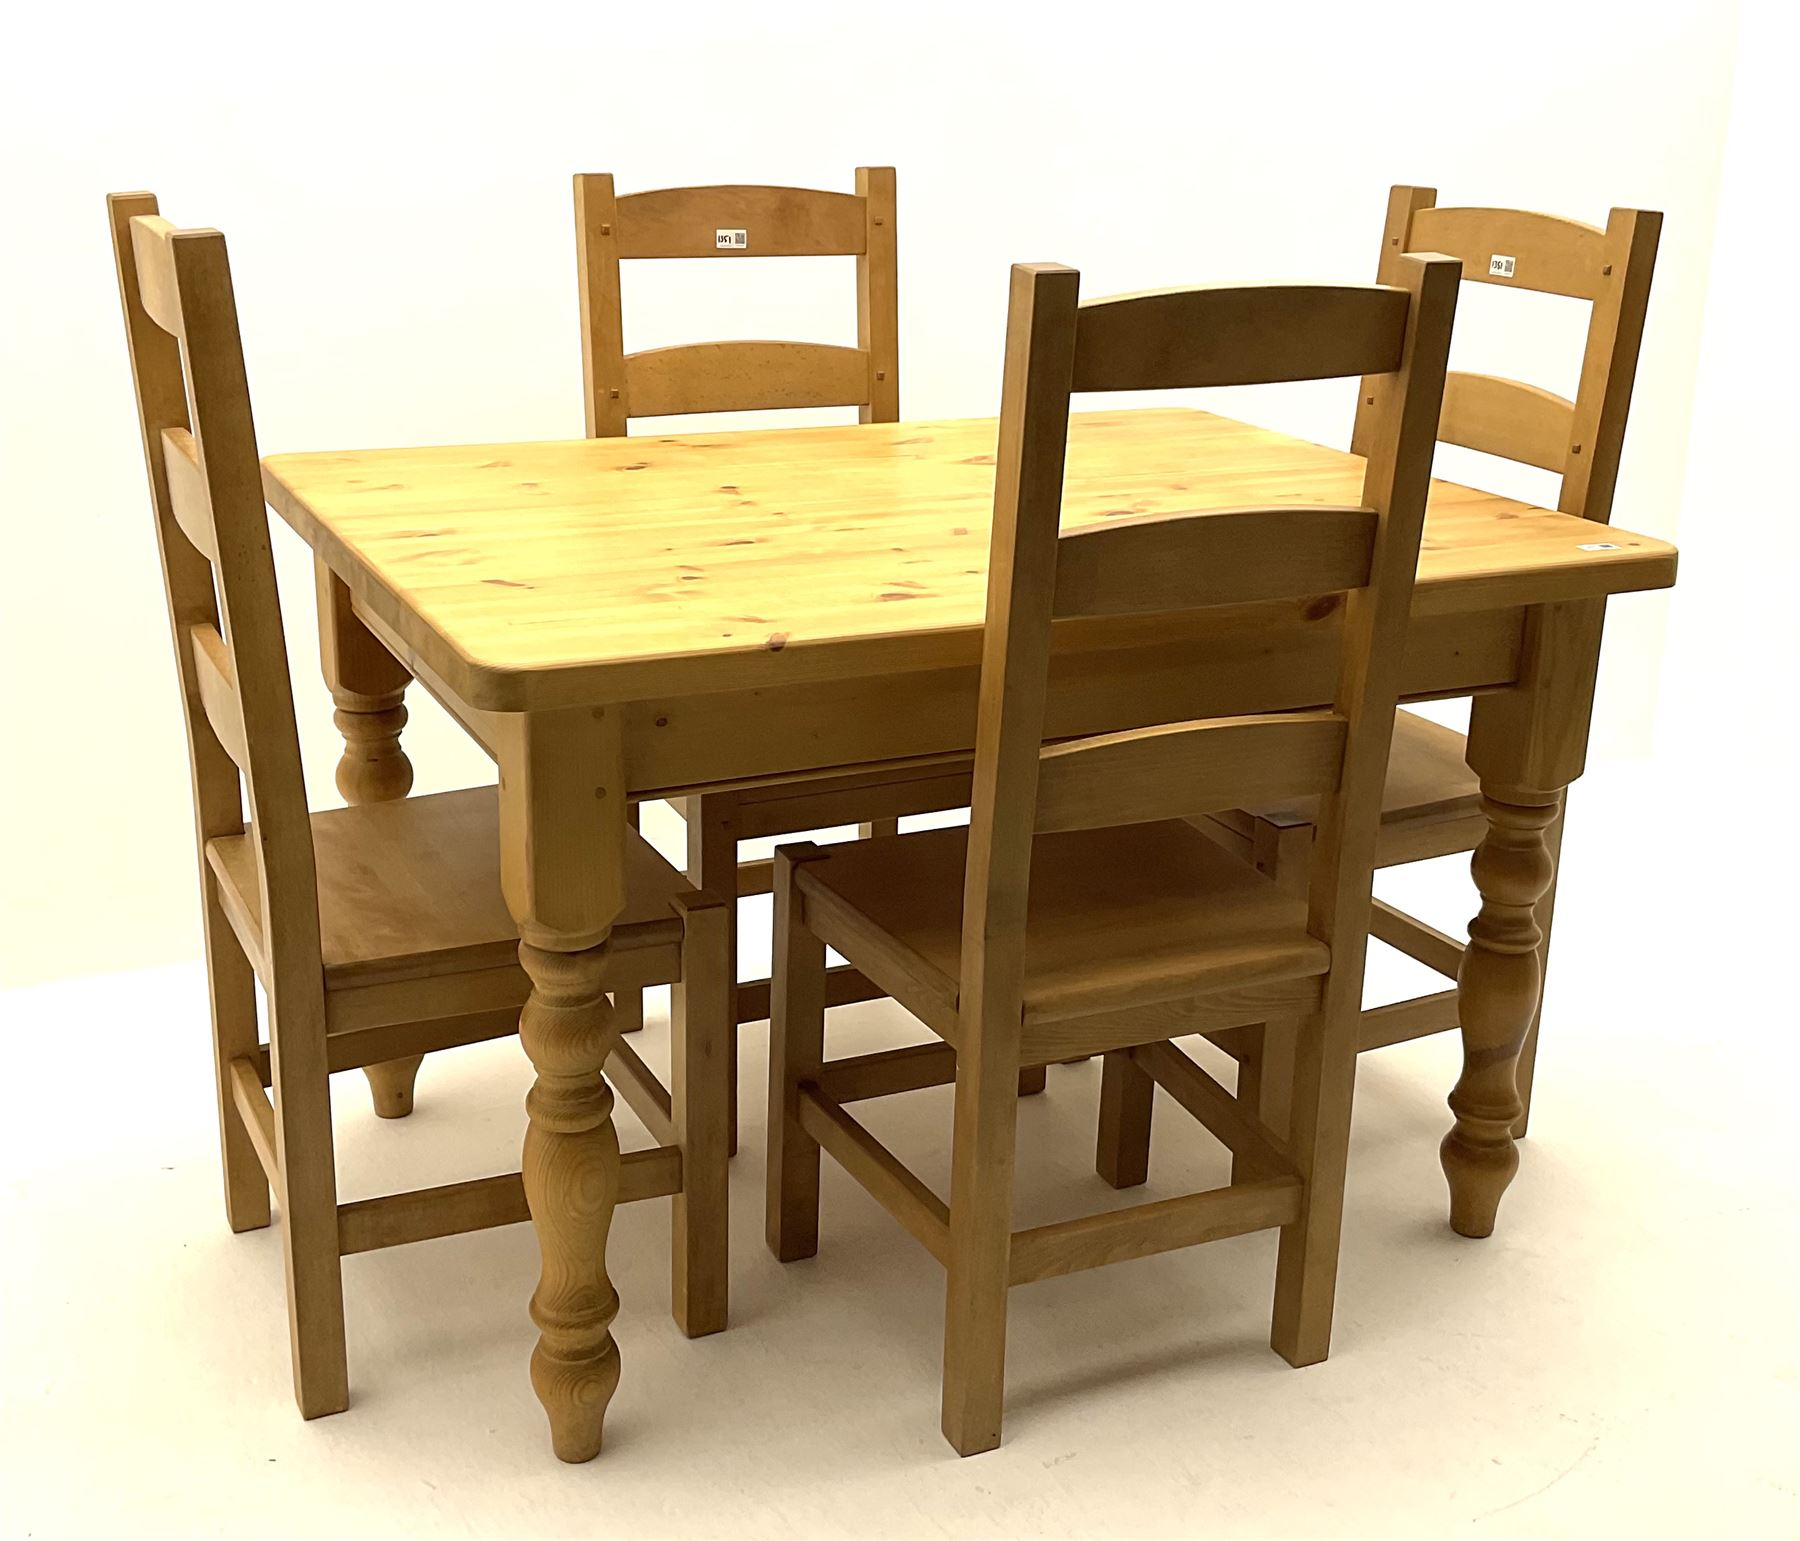 Rectangular pine farmhouse table - Image 2 of 3